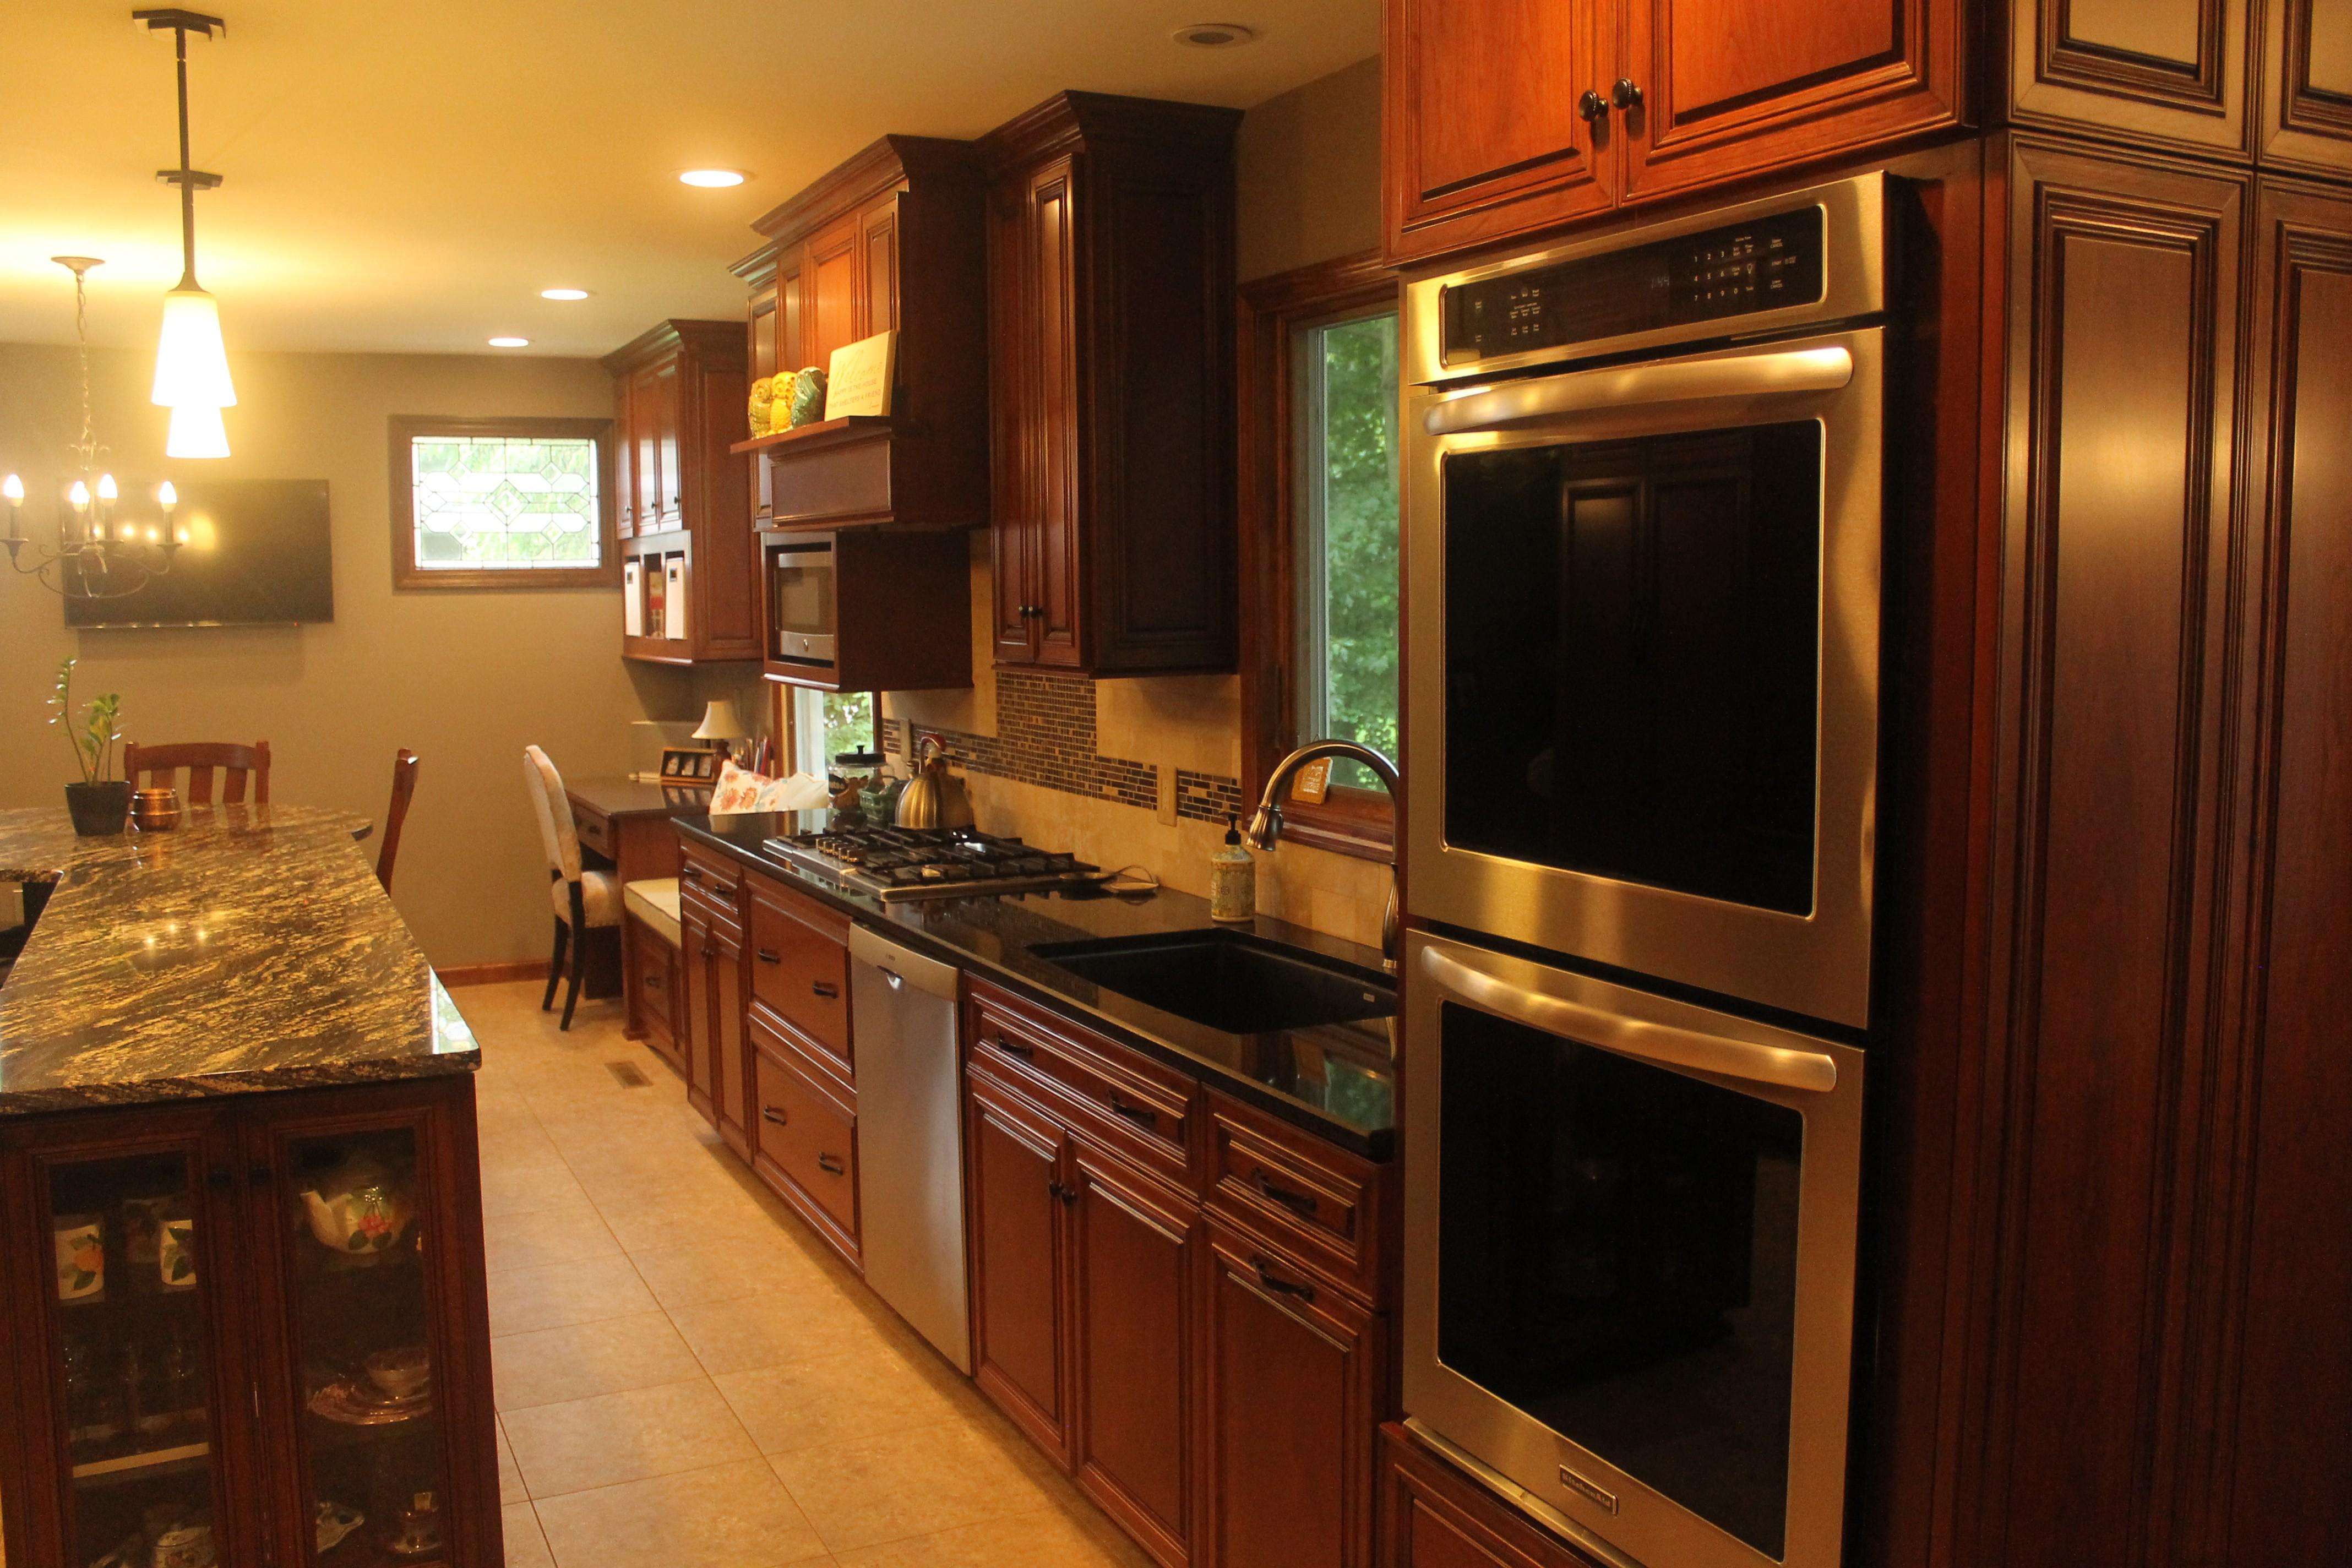 wood acres drive kitchen amish kitchen gallery project description